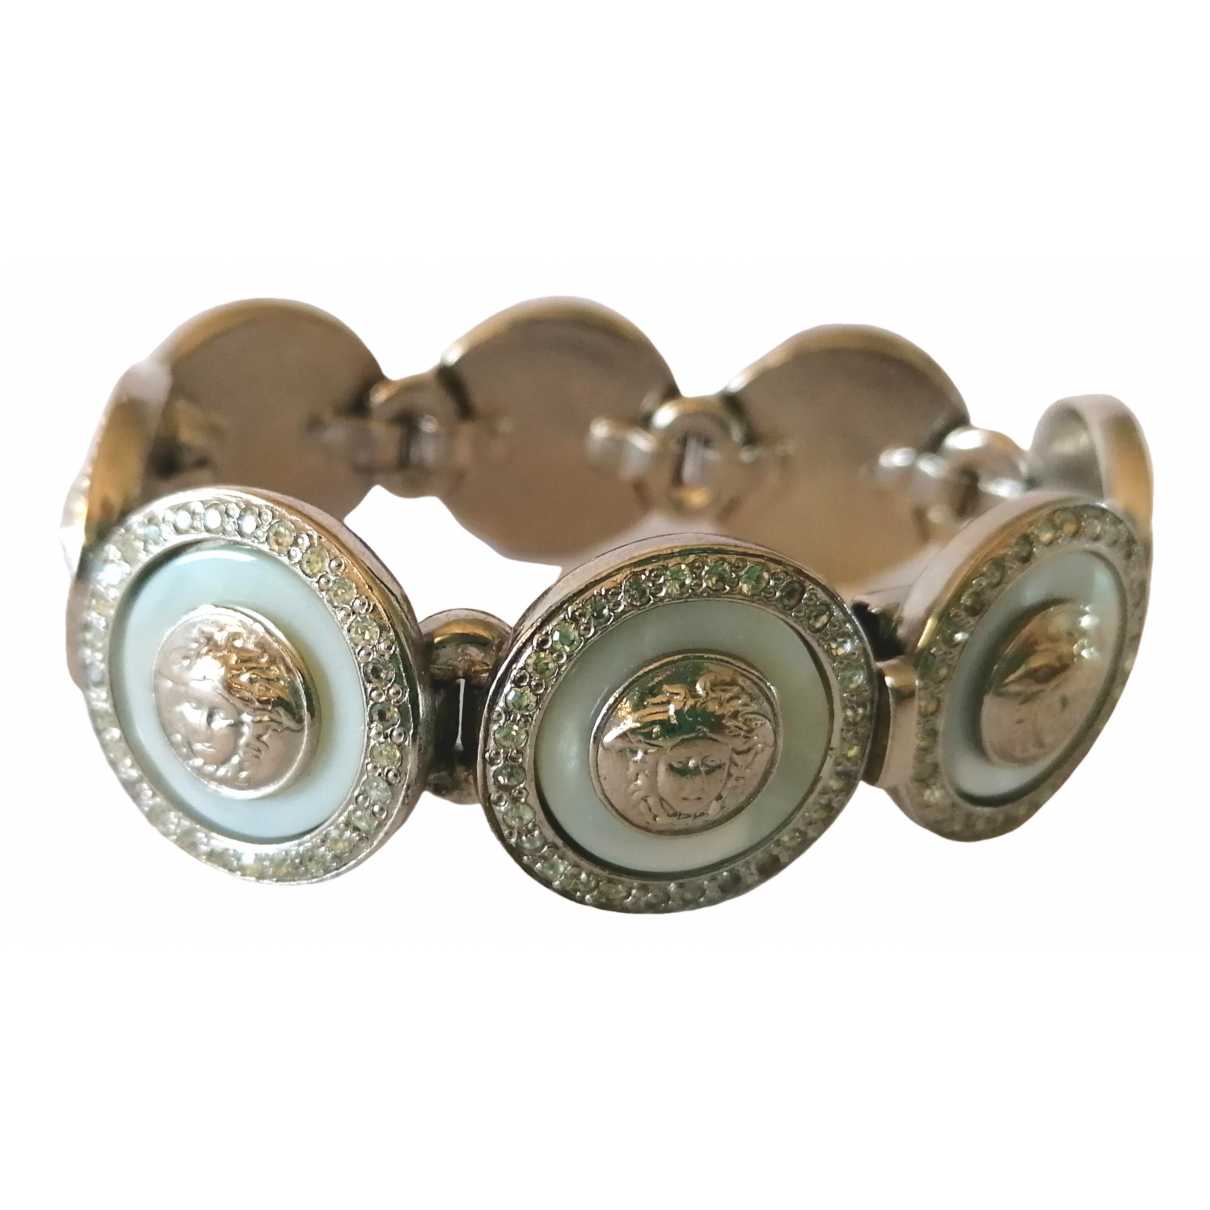 Versace Medusa Armband in  Silber Metall